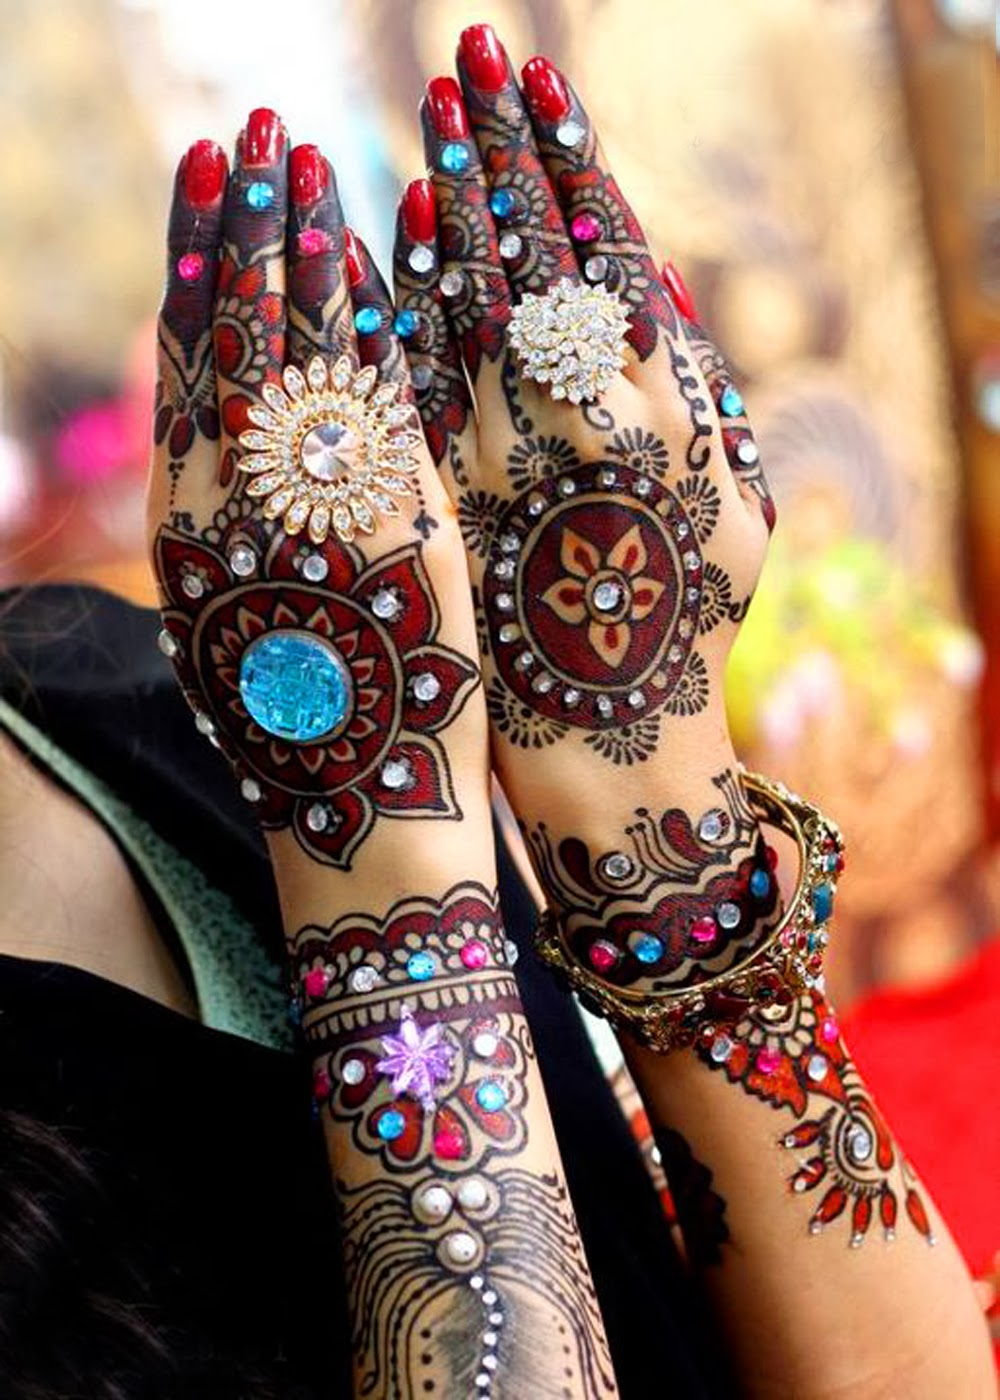 Pakistani Mehndi Design For Hands - Latest Mehndi Designs ...  Pakistani Mehnd...